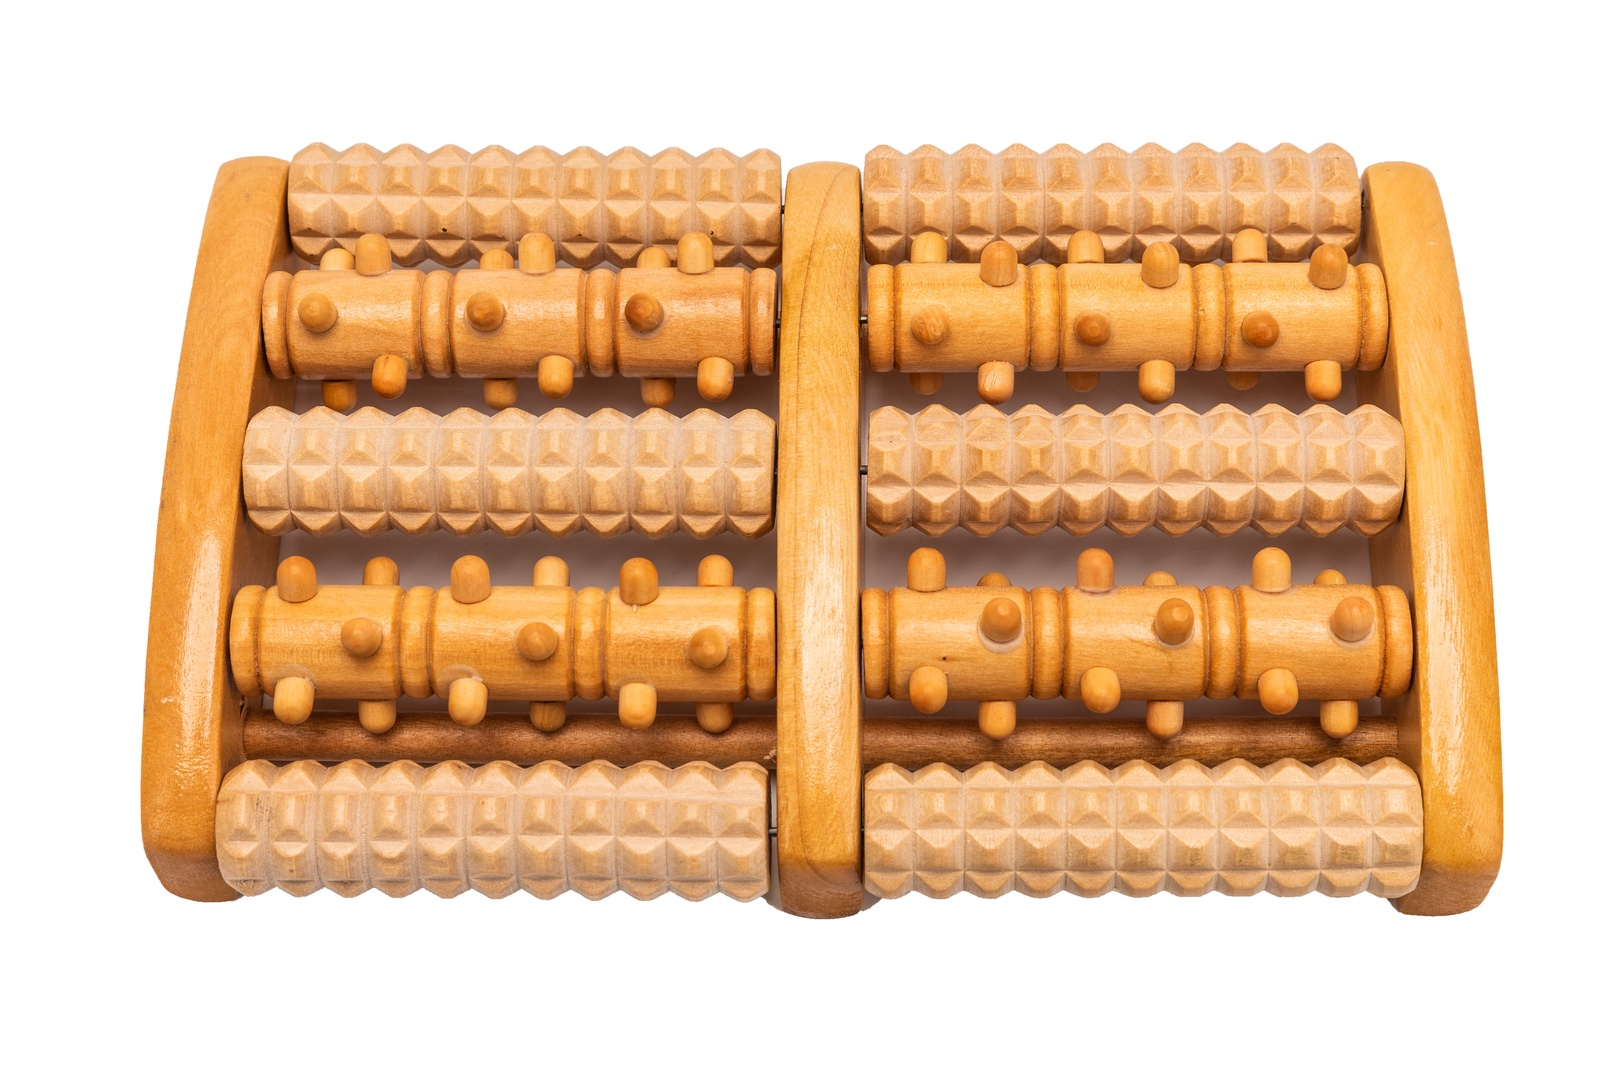 Массажер деревянный роликовый массажер цептер инструкция